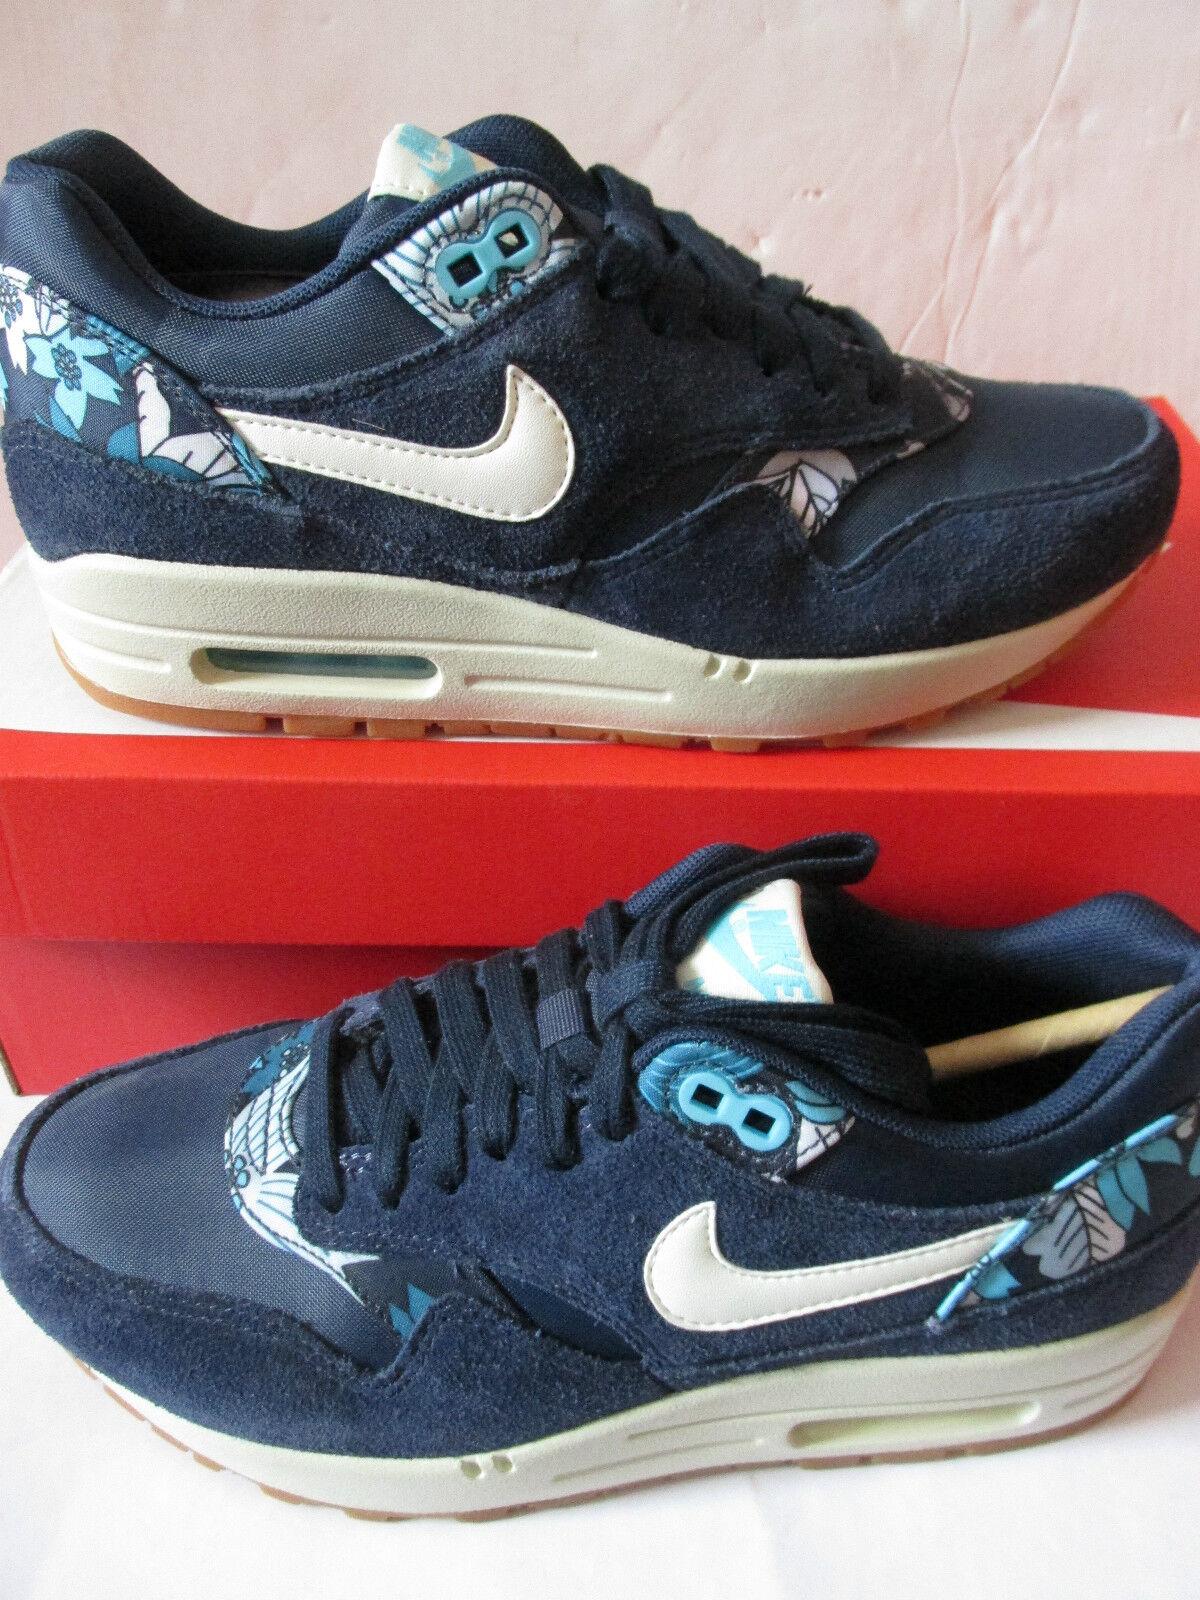 Haut femme nike air max max max 1 print formateurs chaussures baskets 528898 401 0878c9